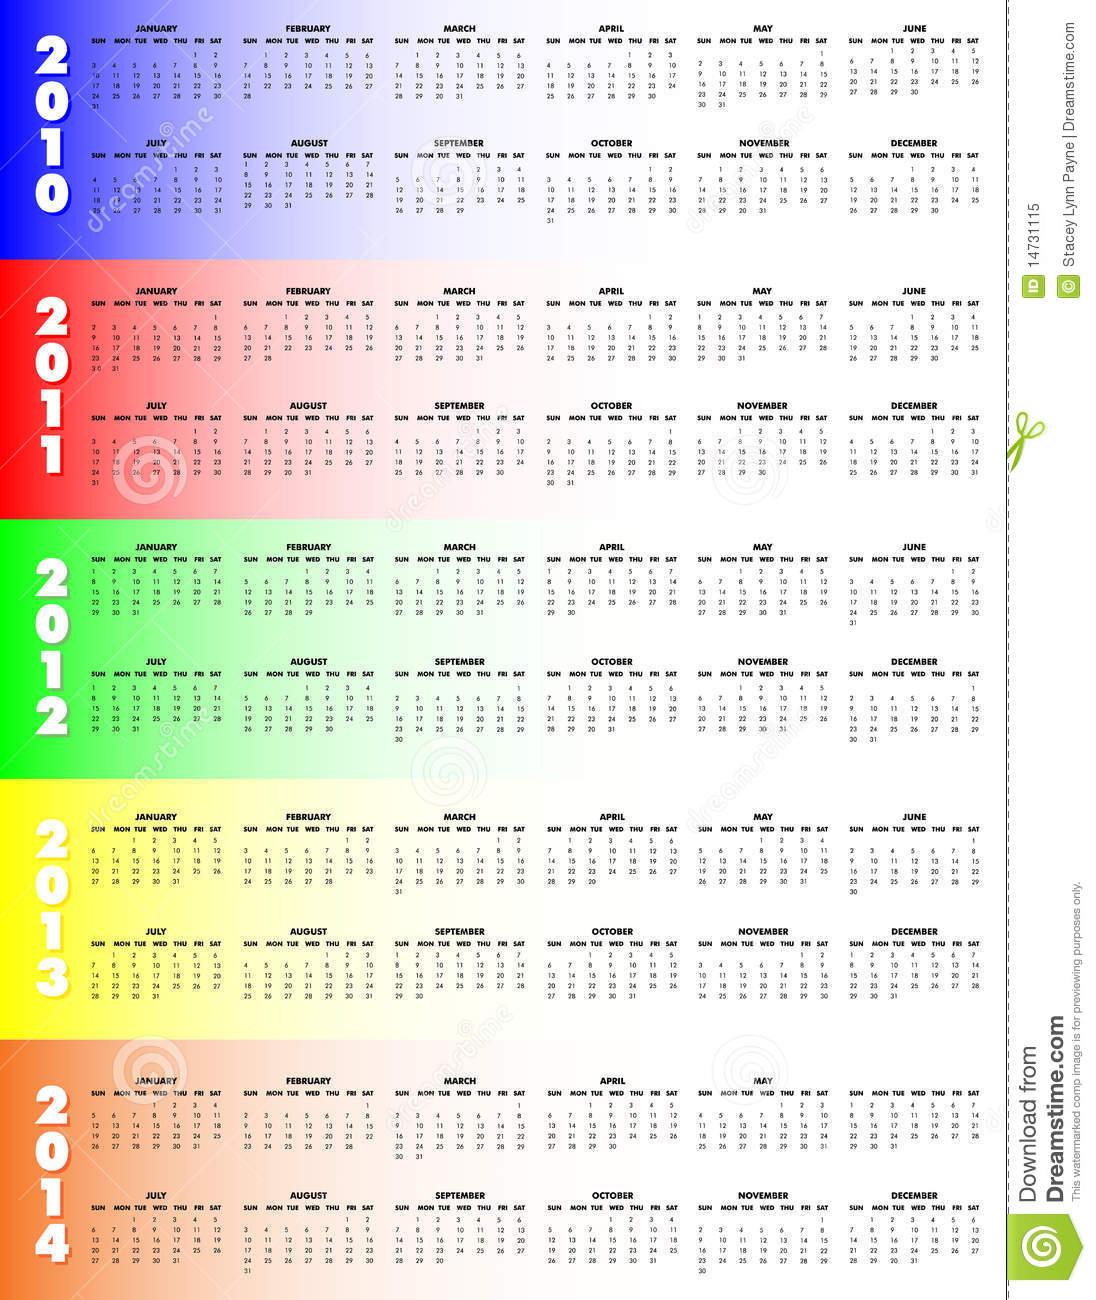 Five Year Calendar 2010 2014 Stock Vector Illustration